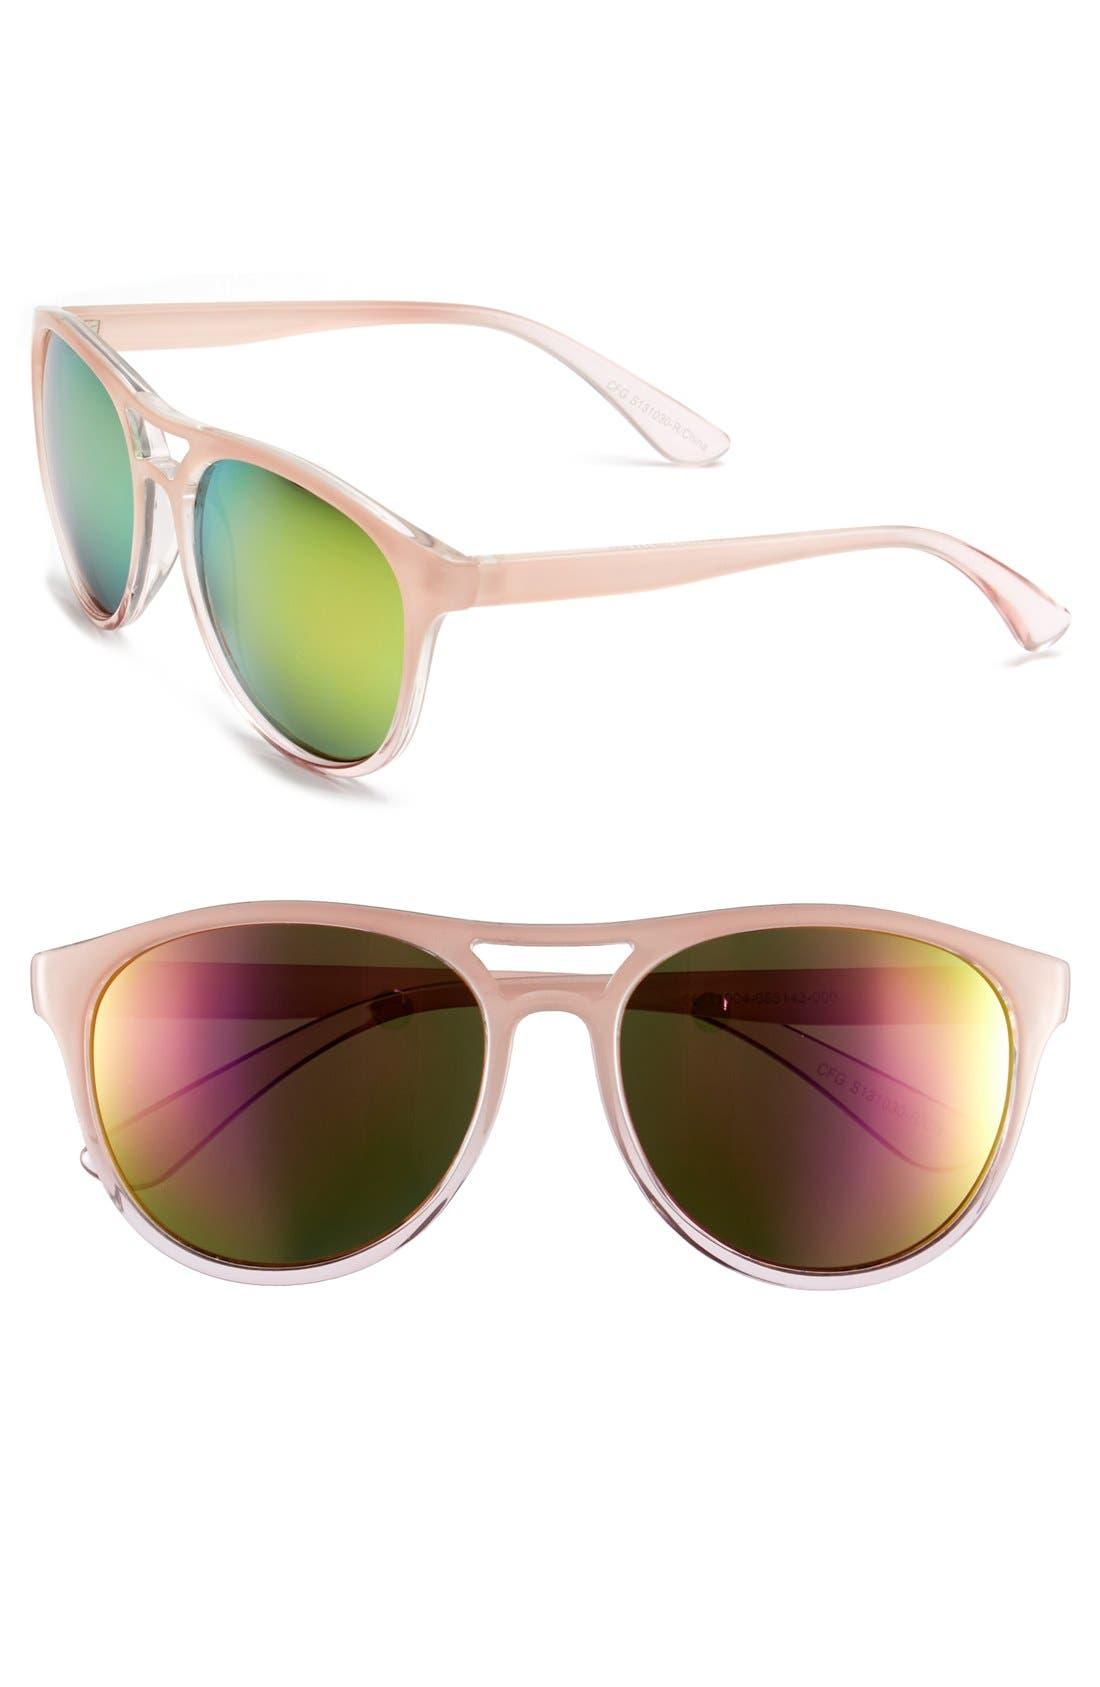 Main Image - BP. 55mm Oversize Retro Sunglasses (Juniors)